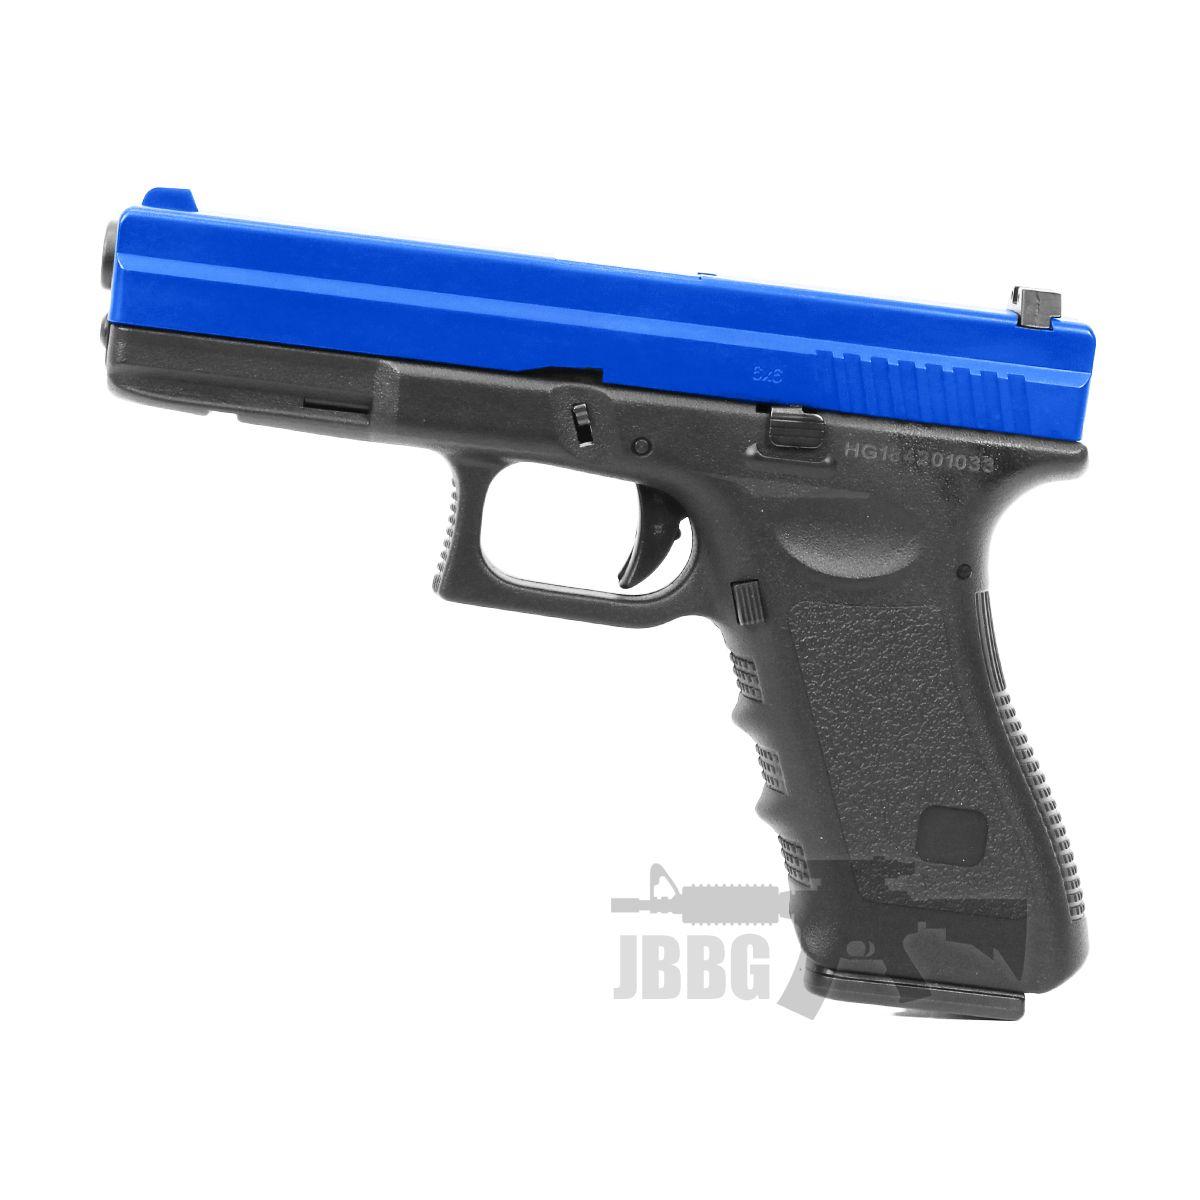 hfc-pistol-airsoft-hg184-blue